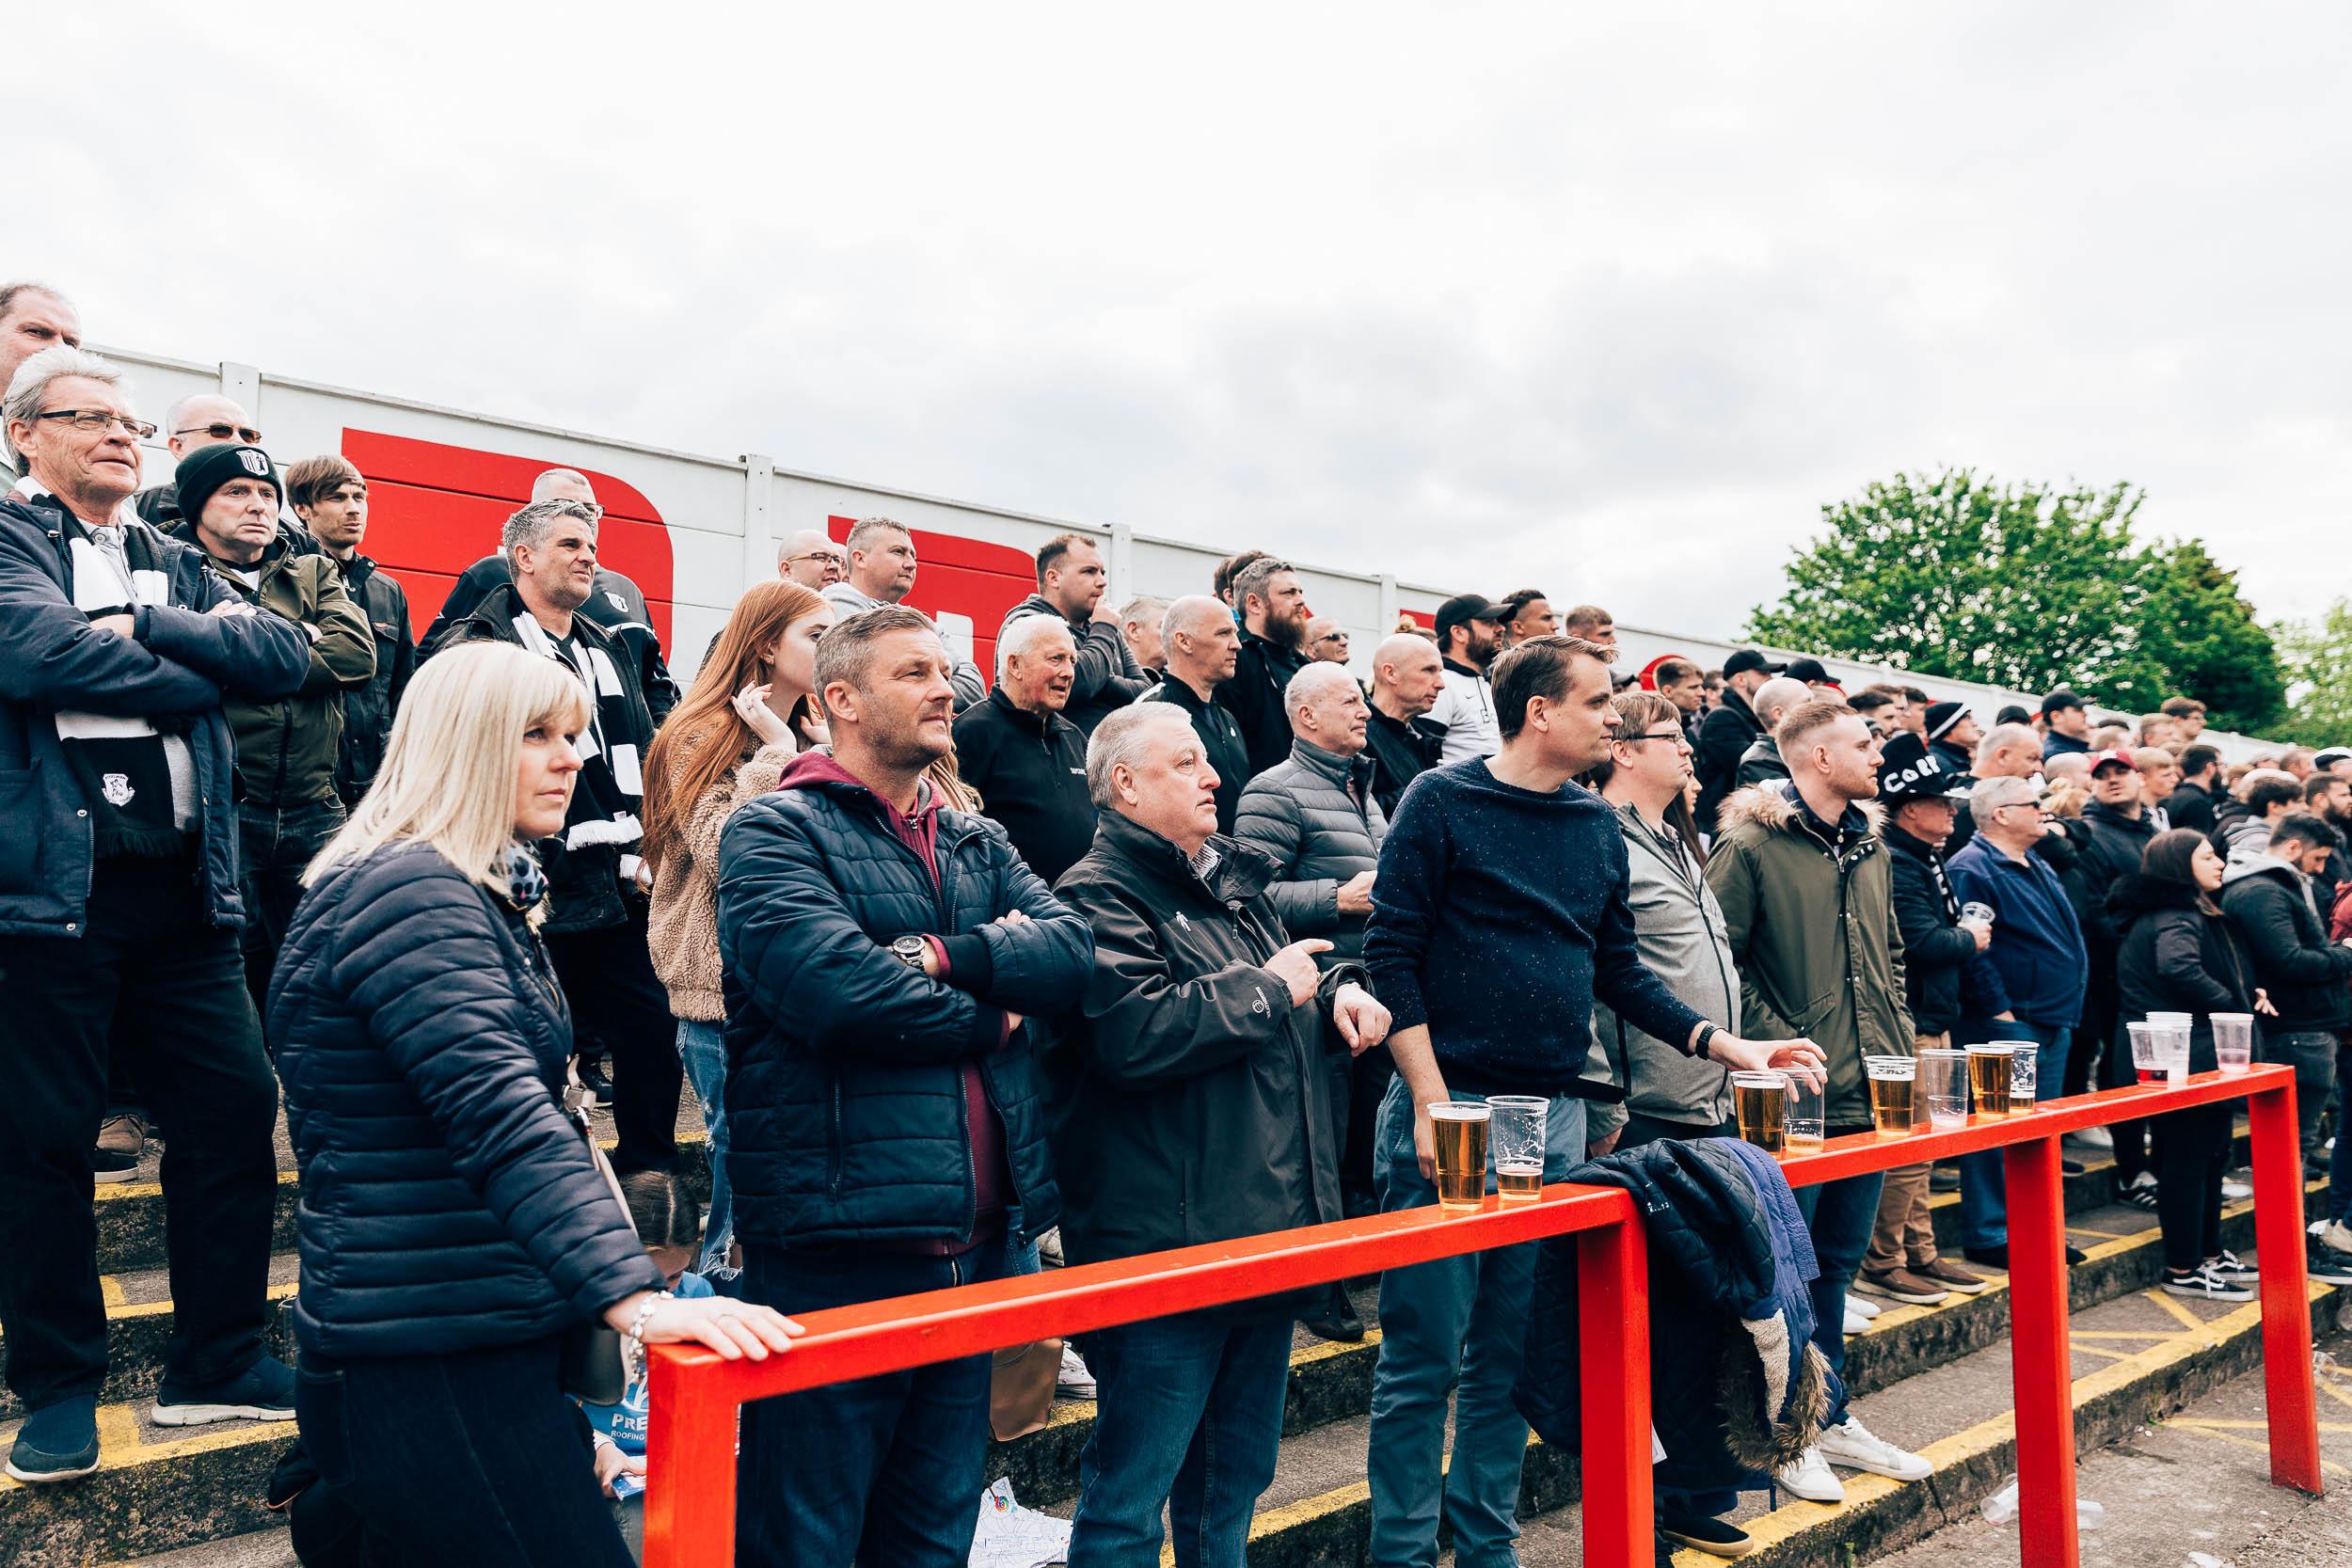 06_05_2019_Bromsgrove_Sporting_Corby-141.jpg